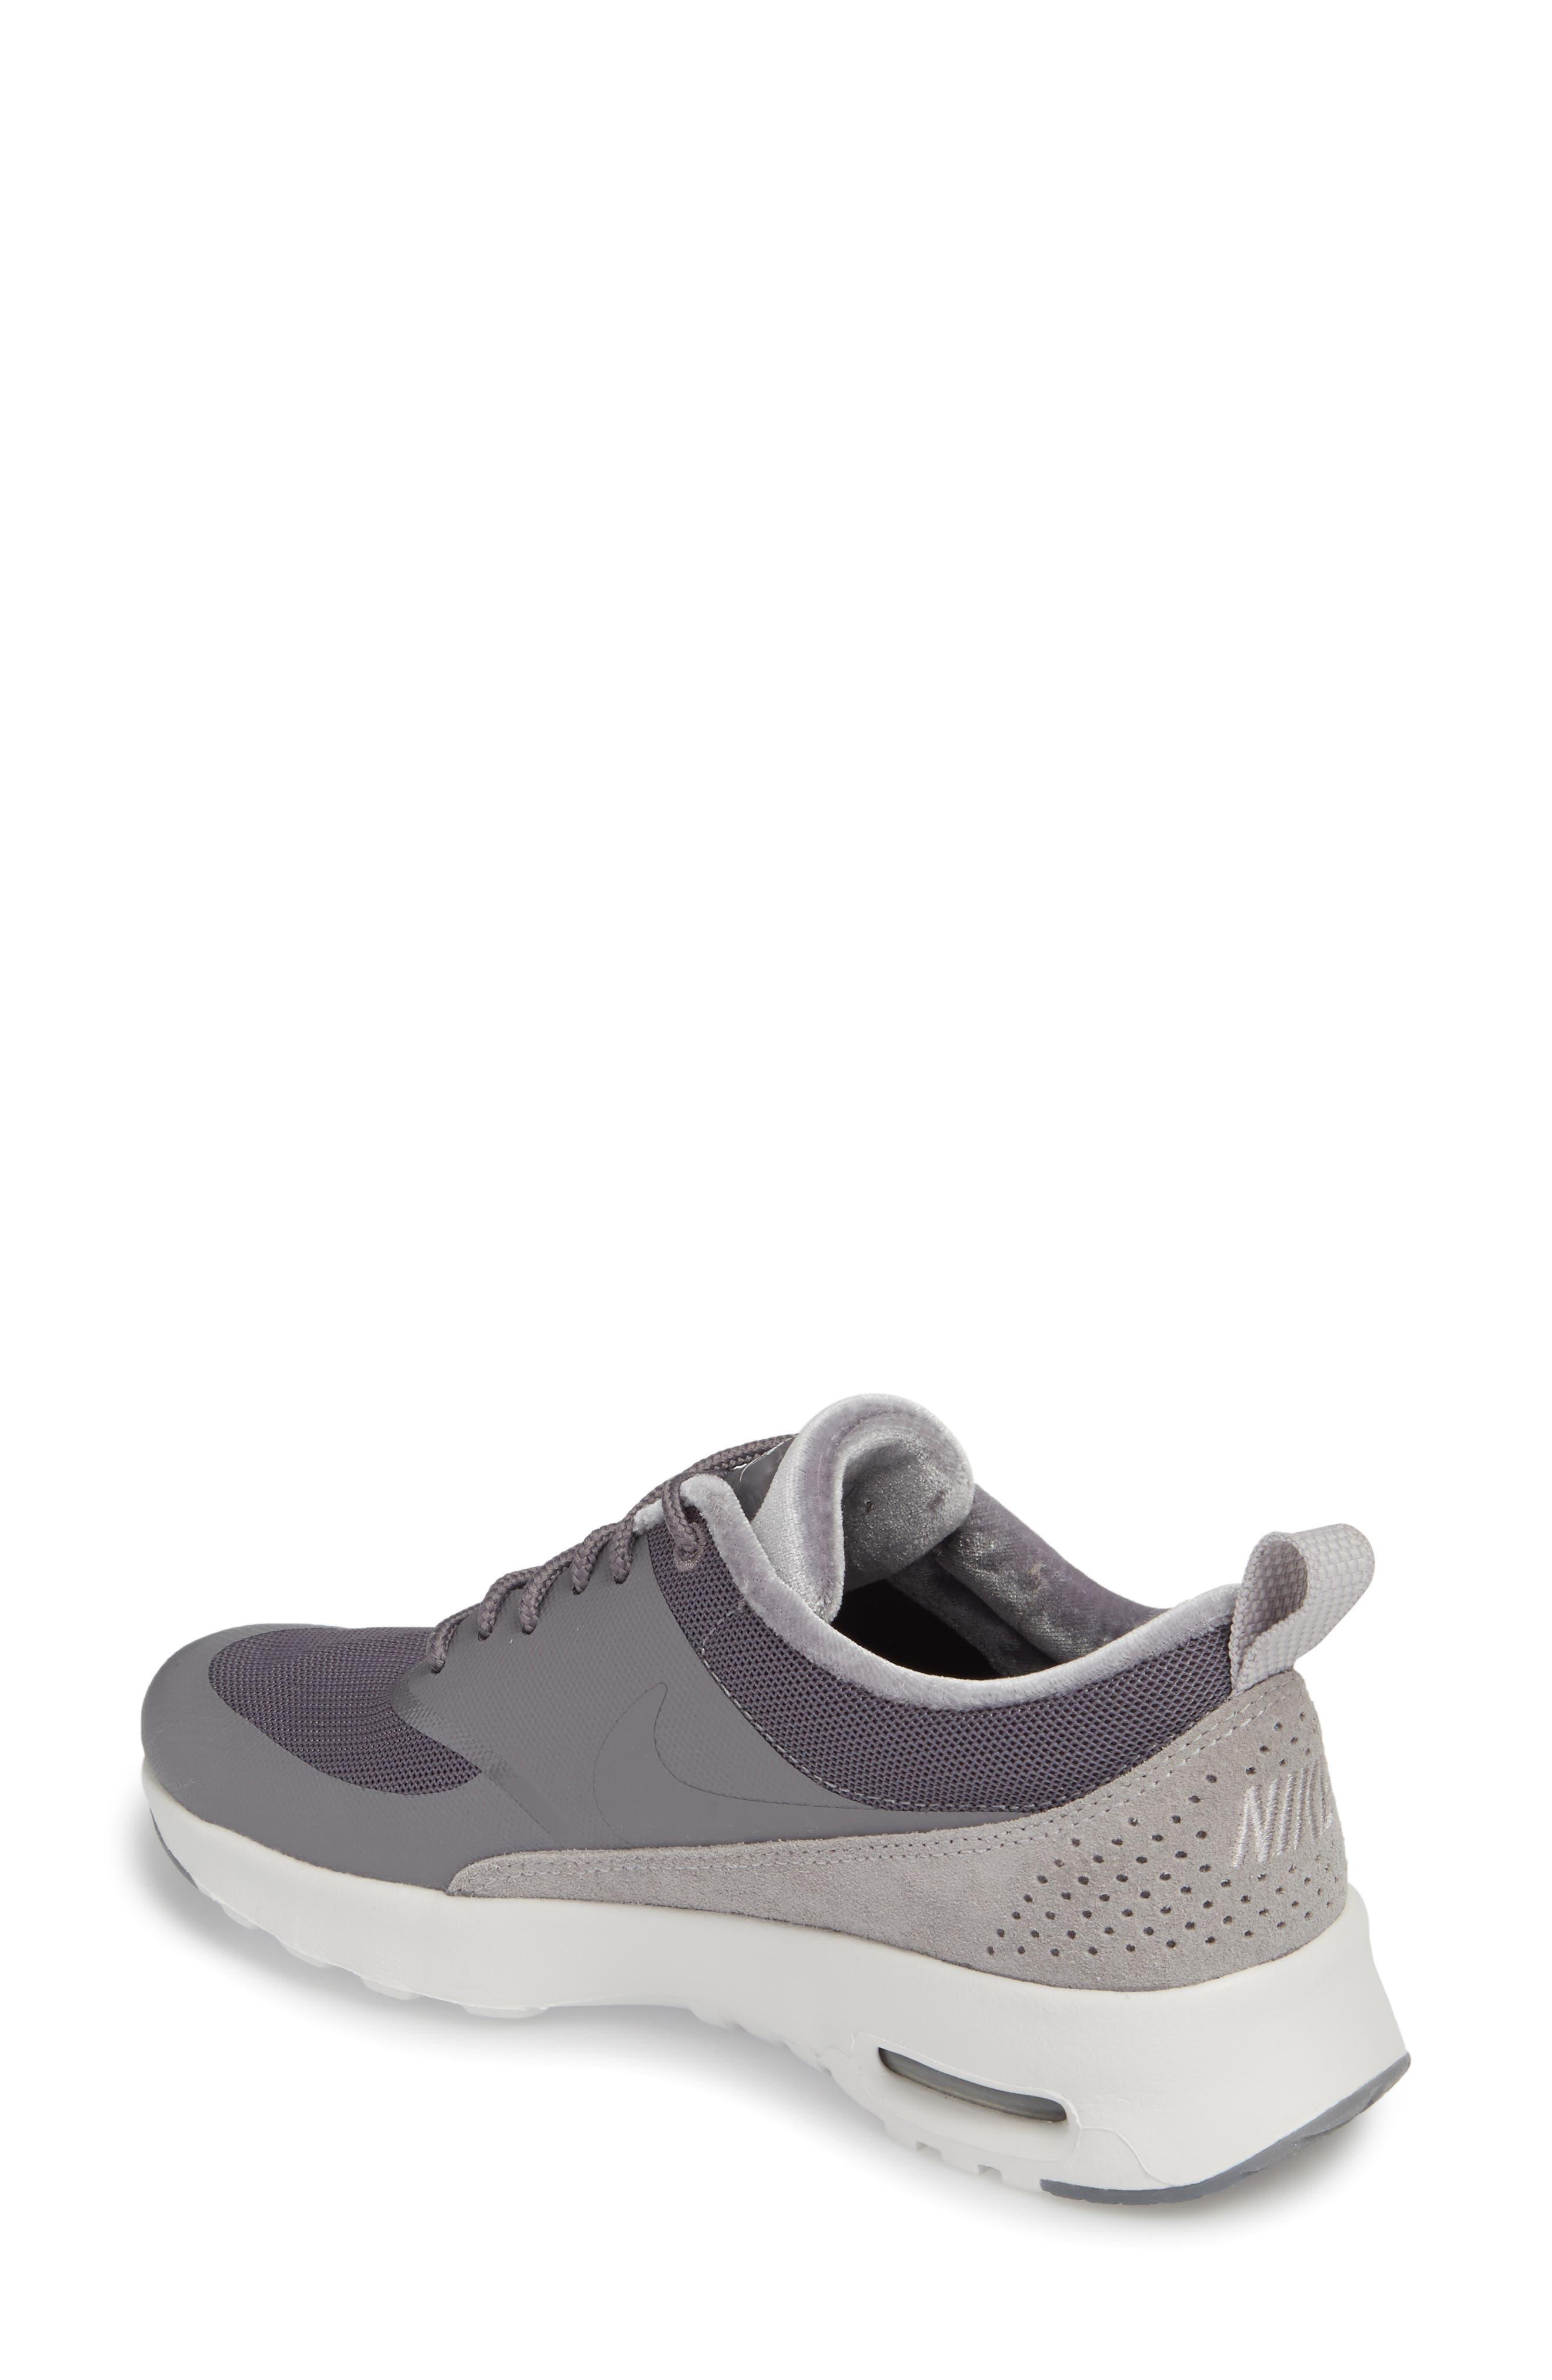 Air Max Thea LX Sneaker,                             Alternate thumbnail 2, color,                             022